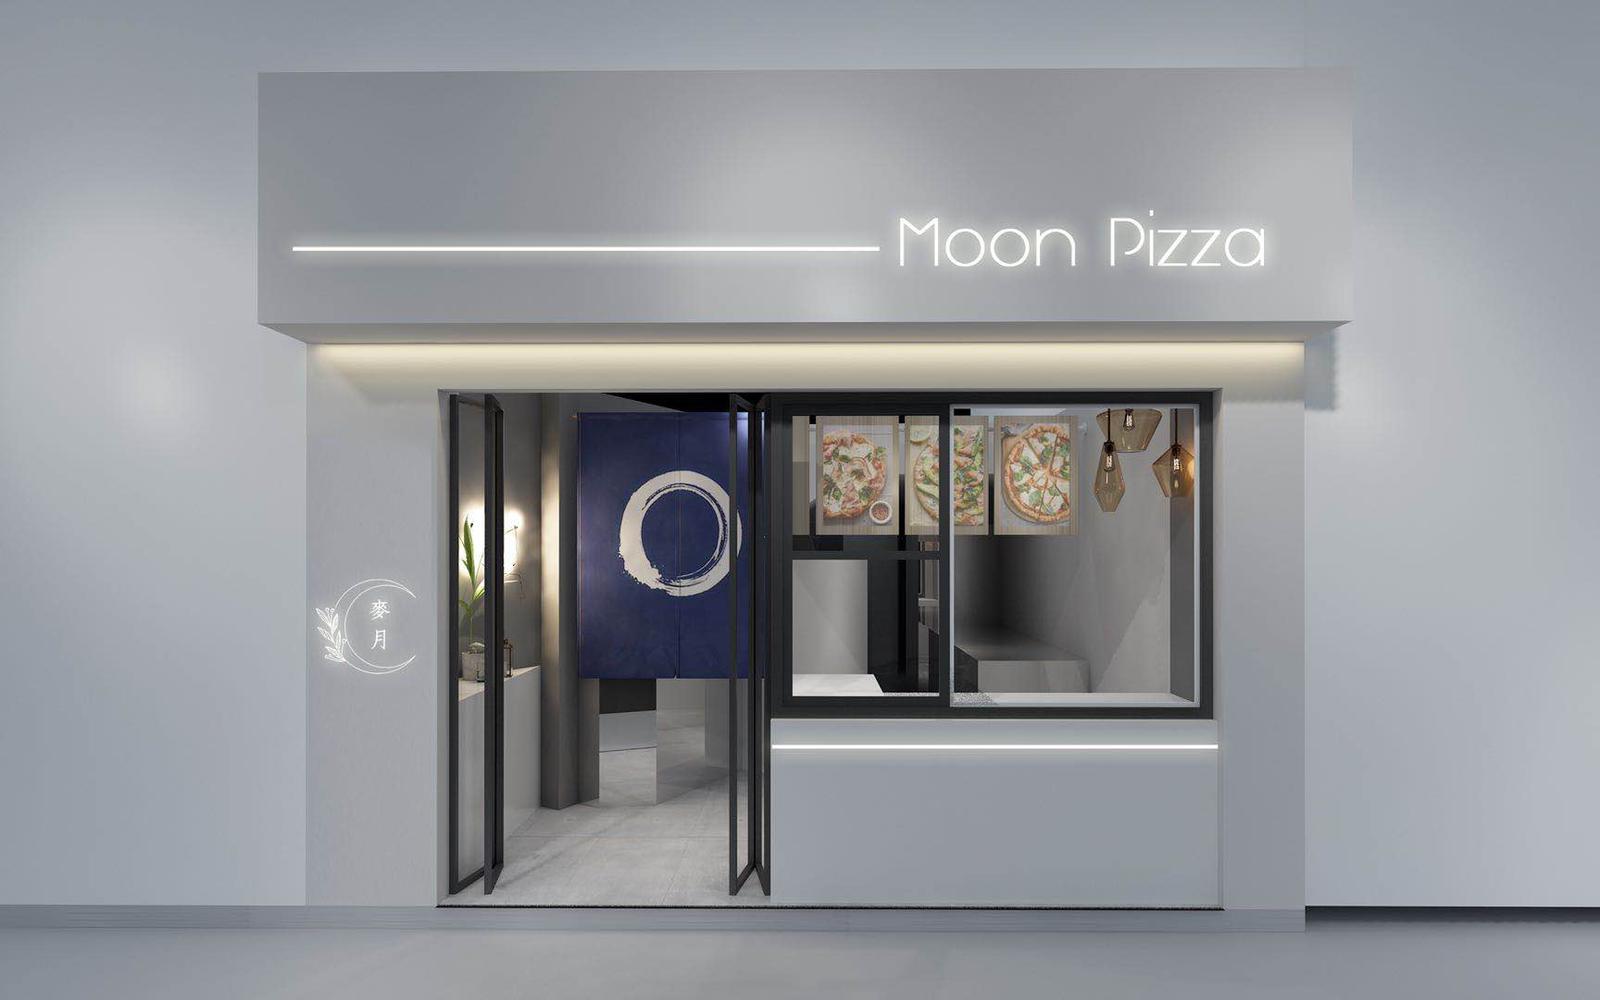 Moonpizza